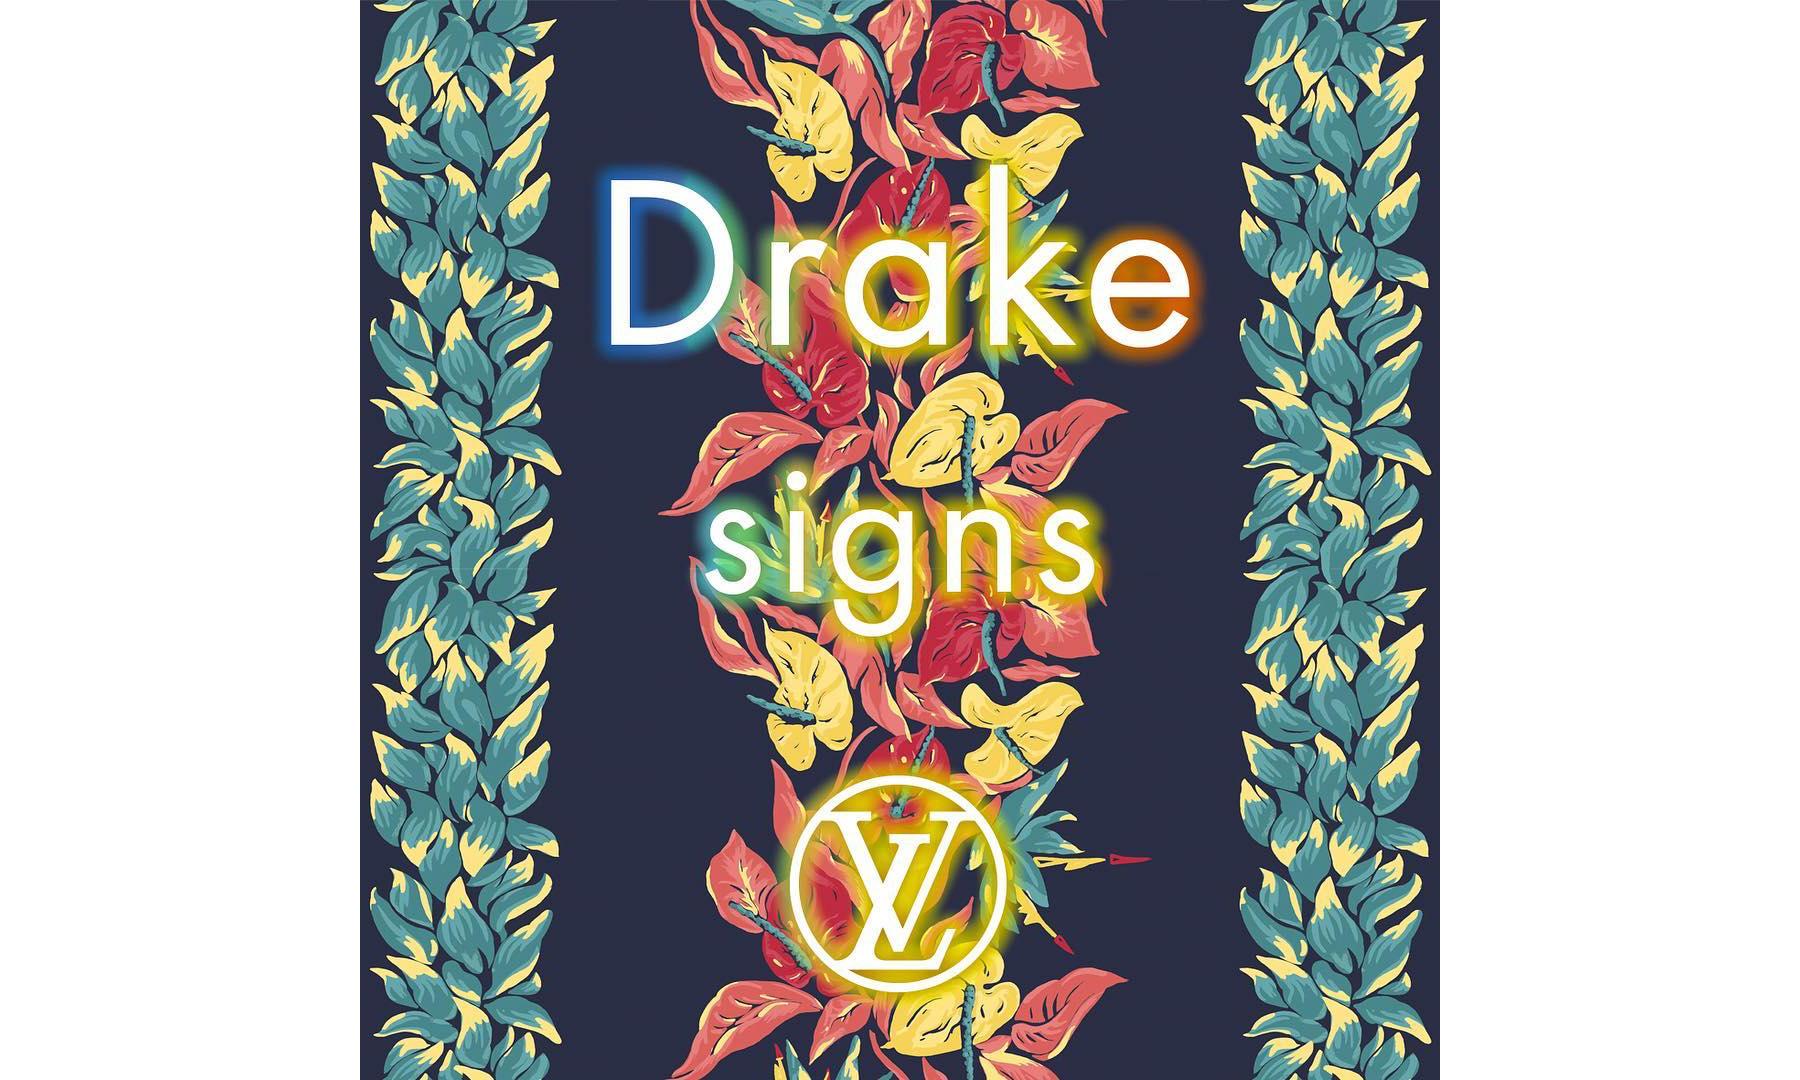 Drake 为 Louis Vuitton 2018 春夏大秀创作新单《Signs》